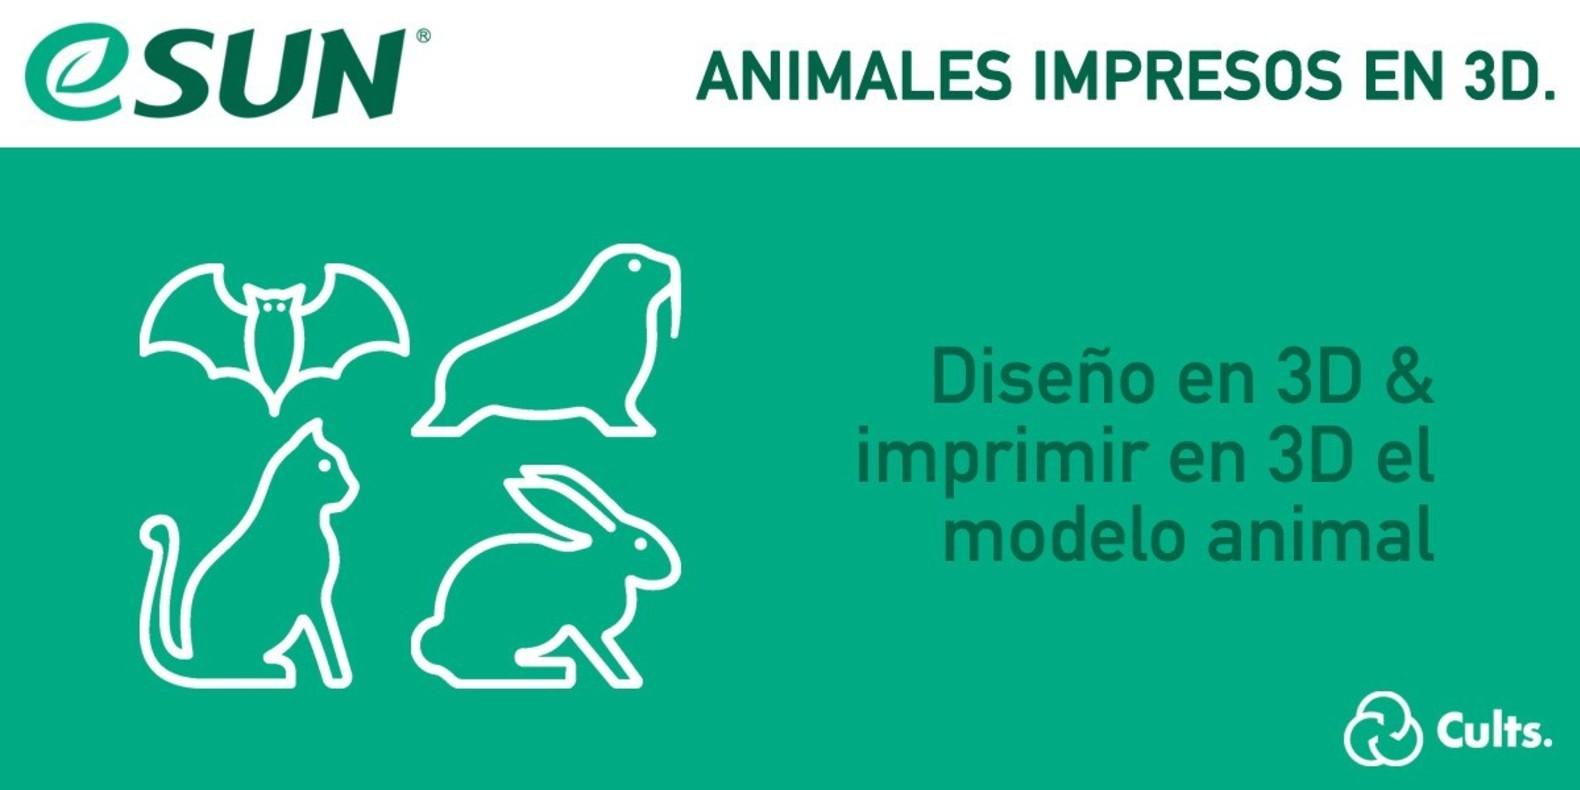 Concurso de impresión 3D con eSun - animales impresos en 3D